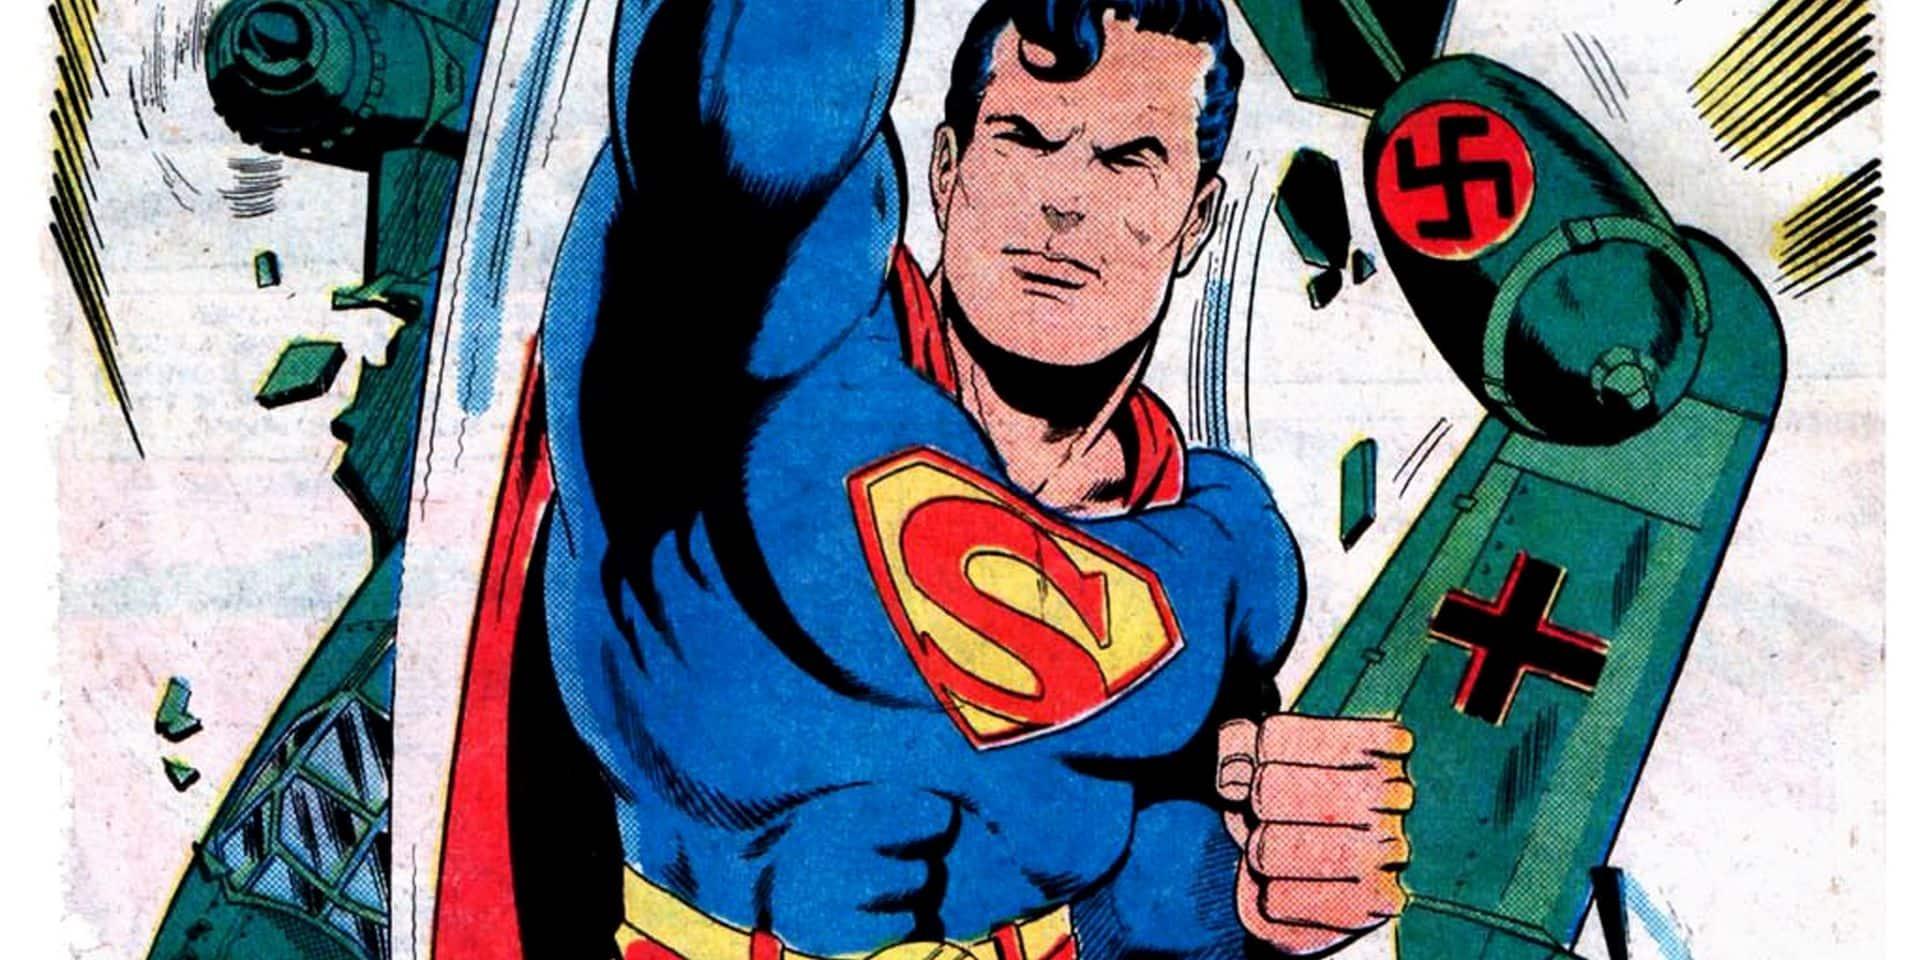 3. Superheroes never die. Comics and Jewish Memories